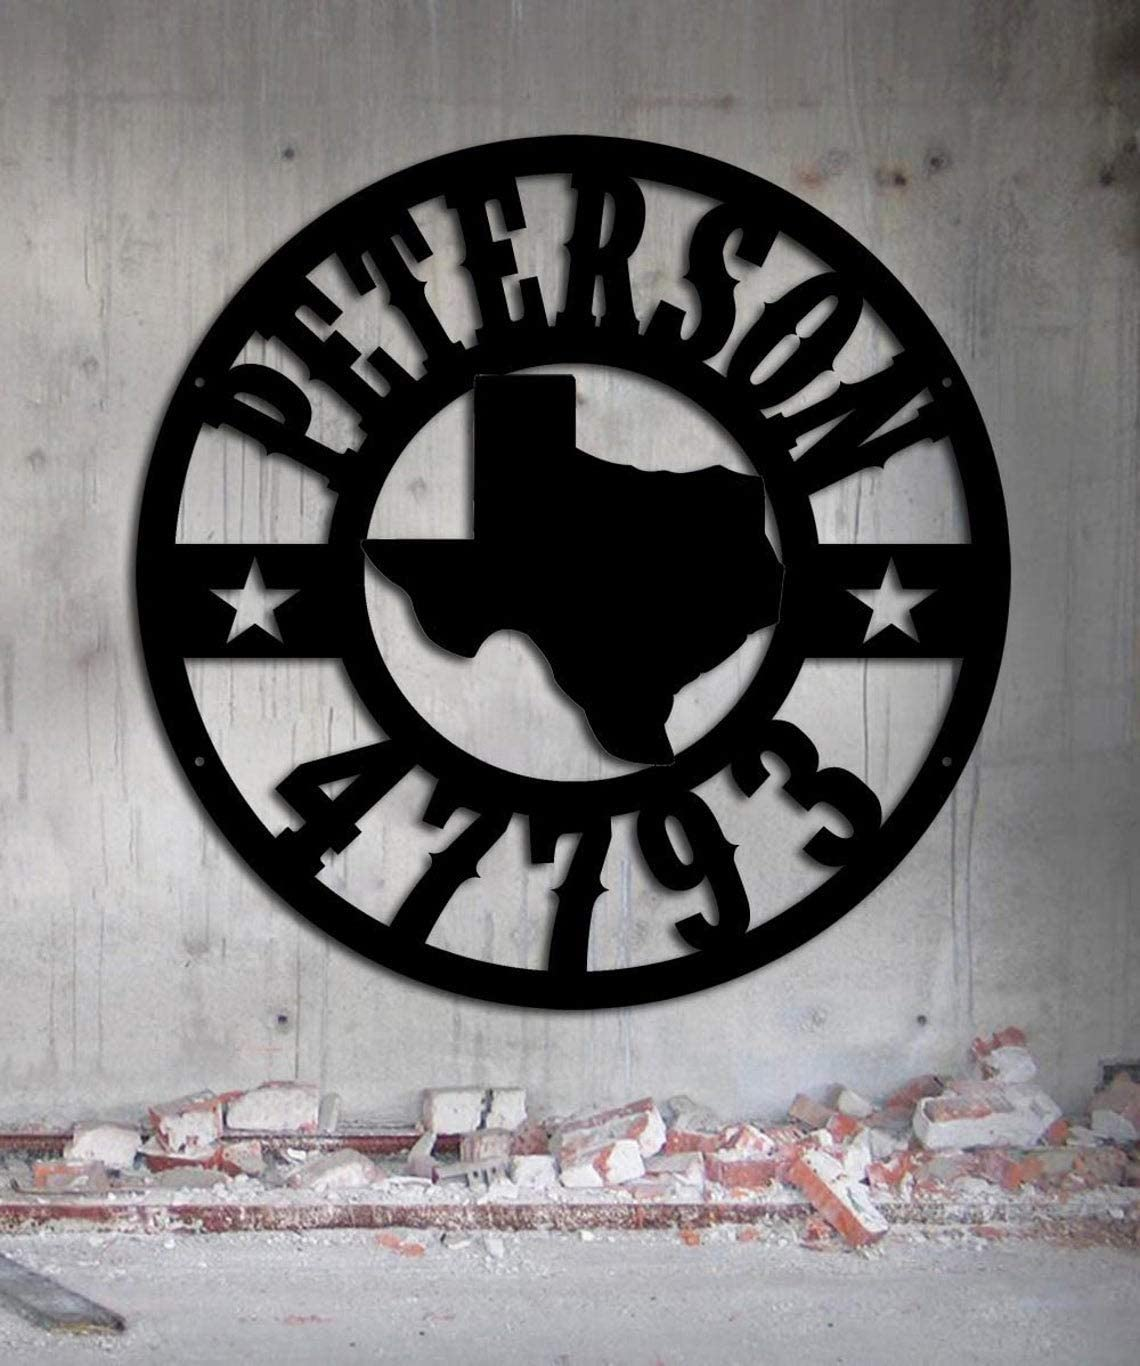 VinMea 激安 Texas Address 47793 Metal Decor Wall Ho 日本全国 送料無料 Art